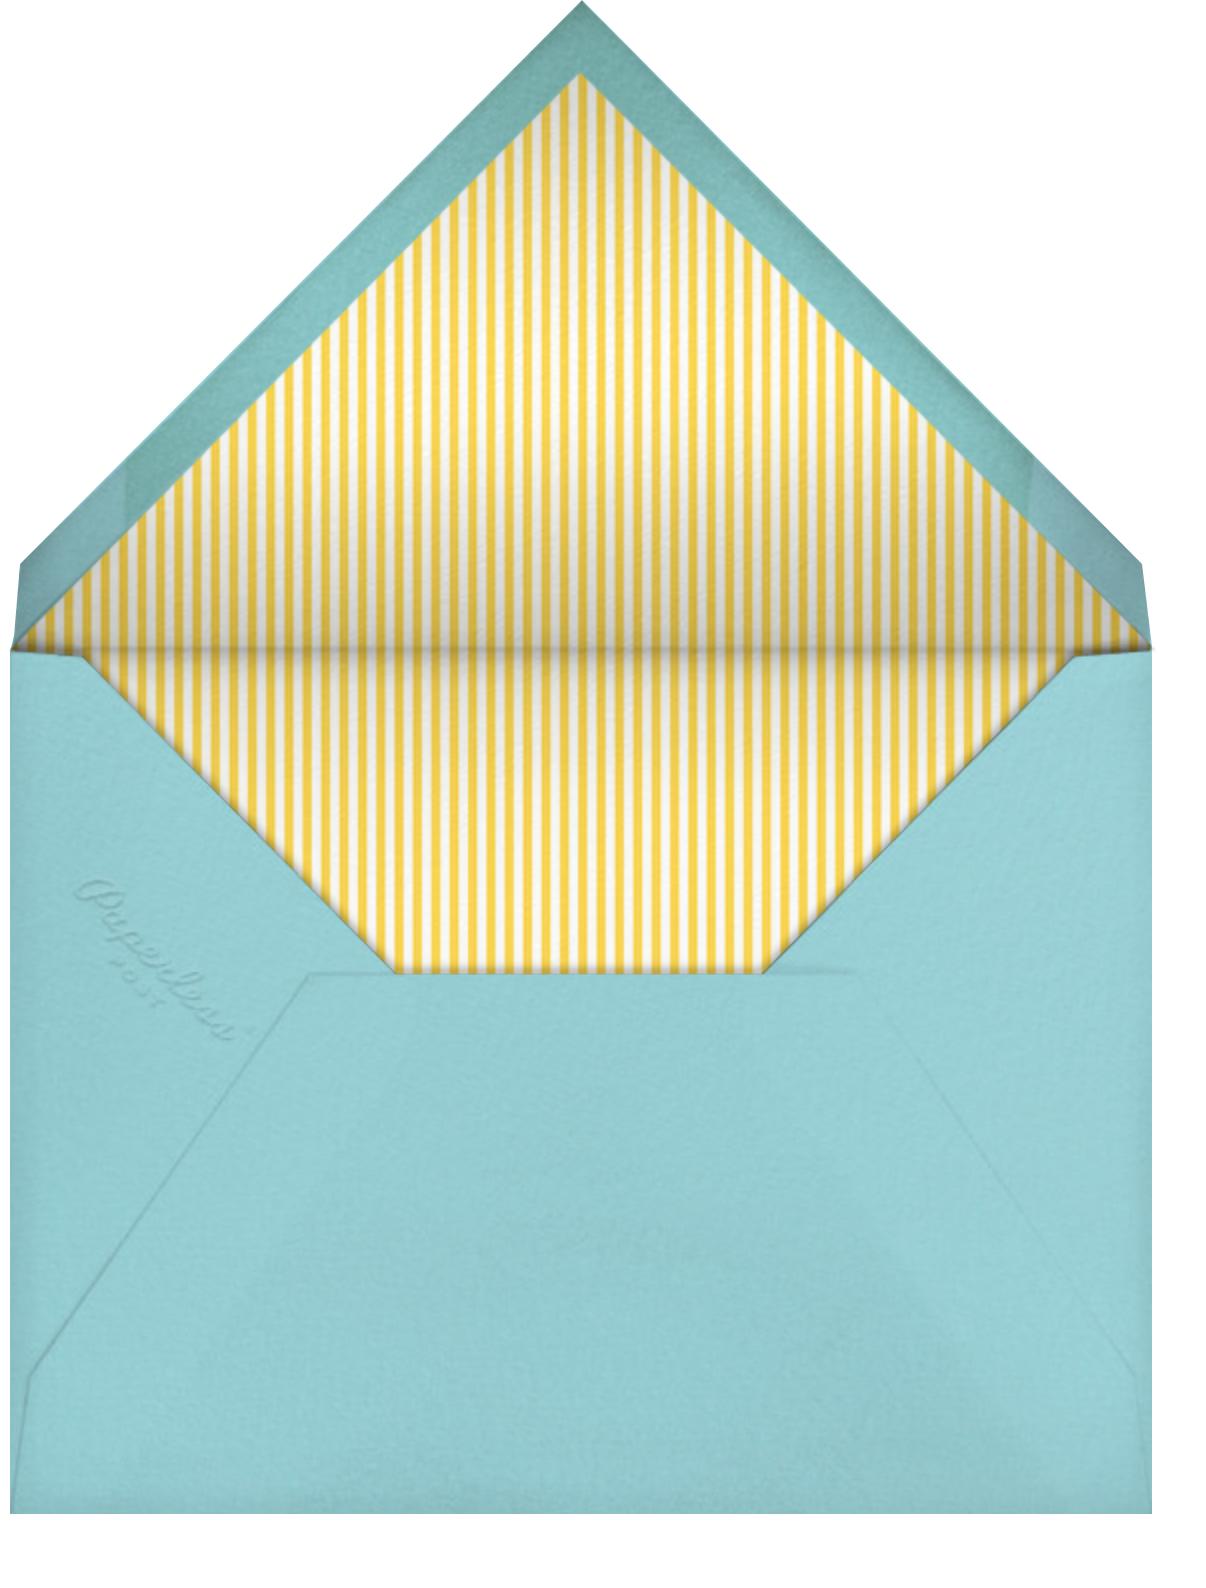 Little Duck's Big Splash - Yellow - Little Cube - Baby shower - envelope back